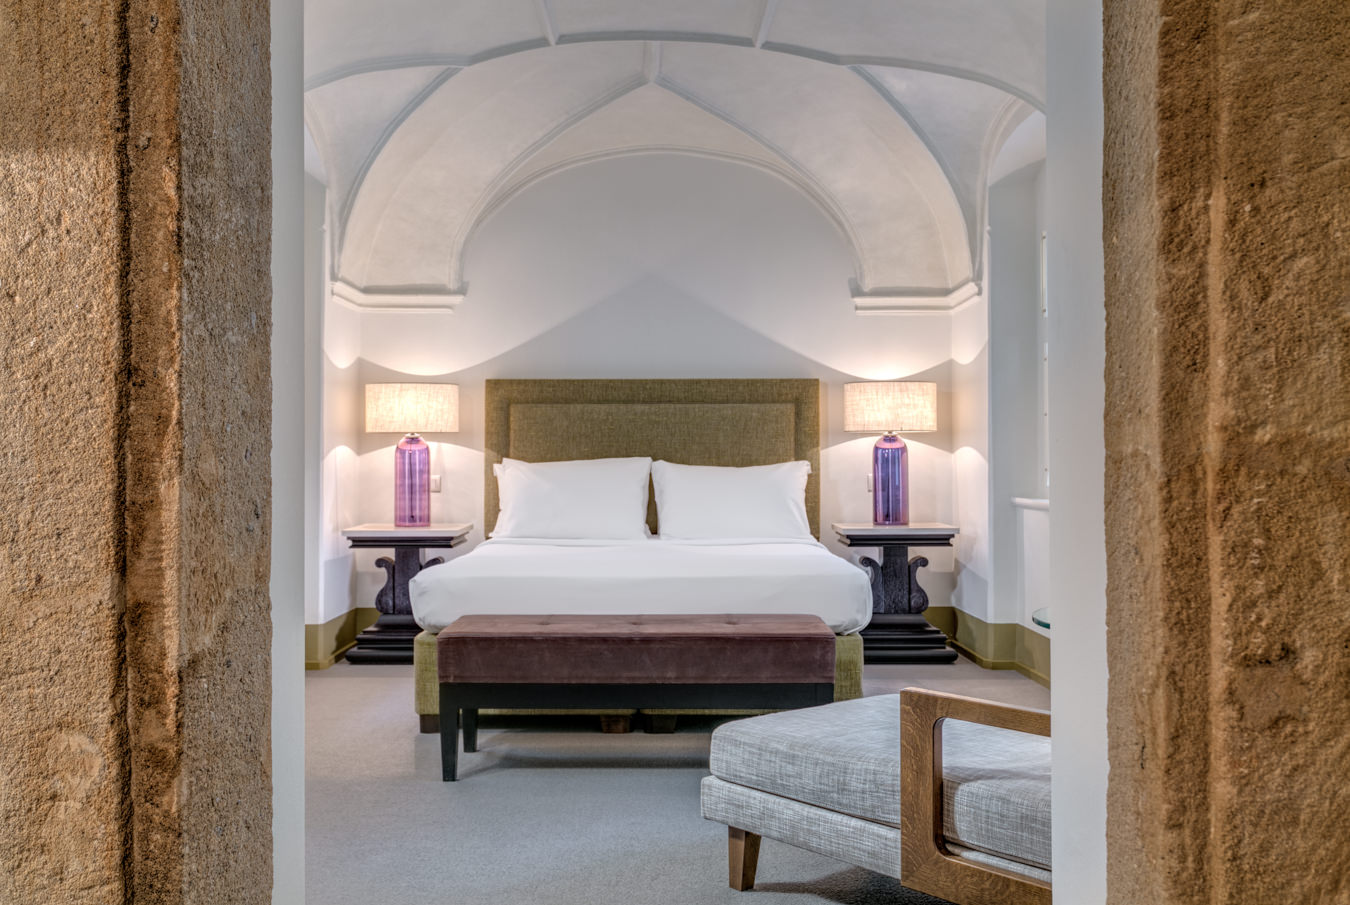 Augustine Hotel, a Luxury Collection Hotel, Prague, Γιώργος Φάκαρος - Αρχιτεκτονική Φωτογραφία | Εσωτερικοί Χώροι | Φωτογραφία Ξενοδοχειών - Photography / Φωτογραφία